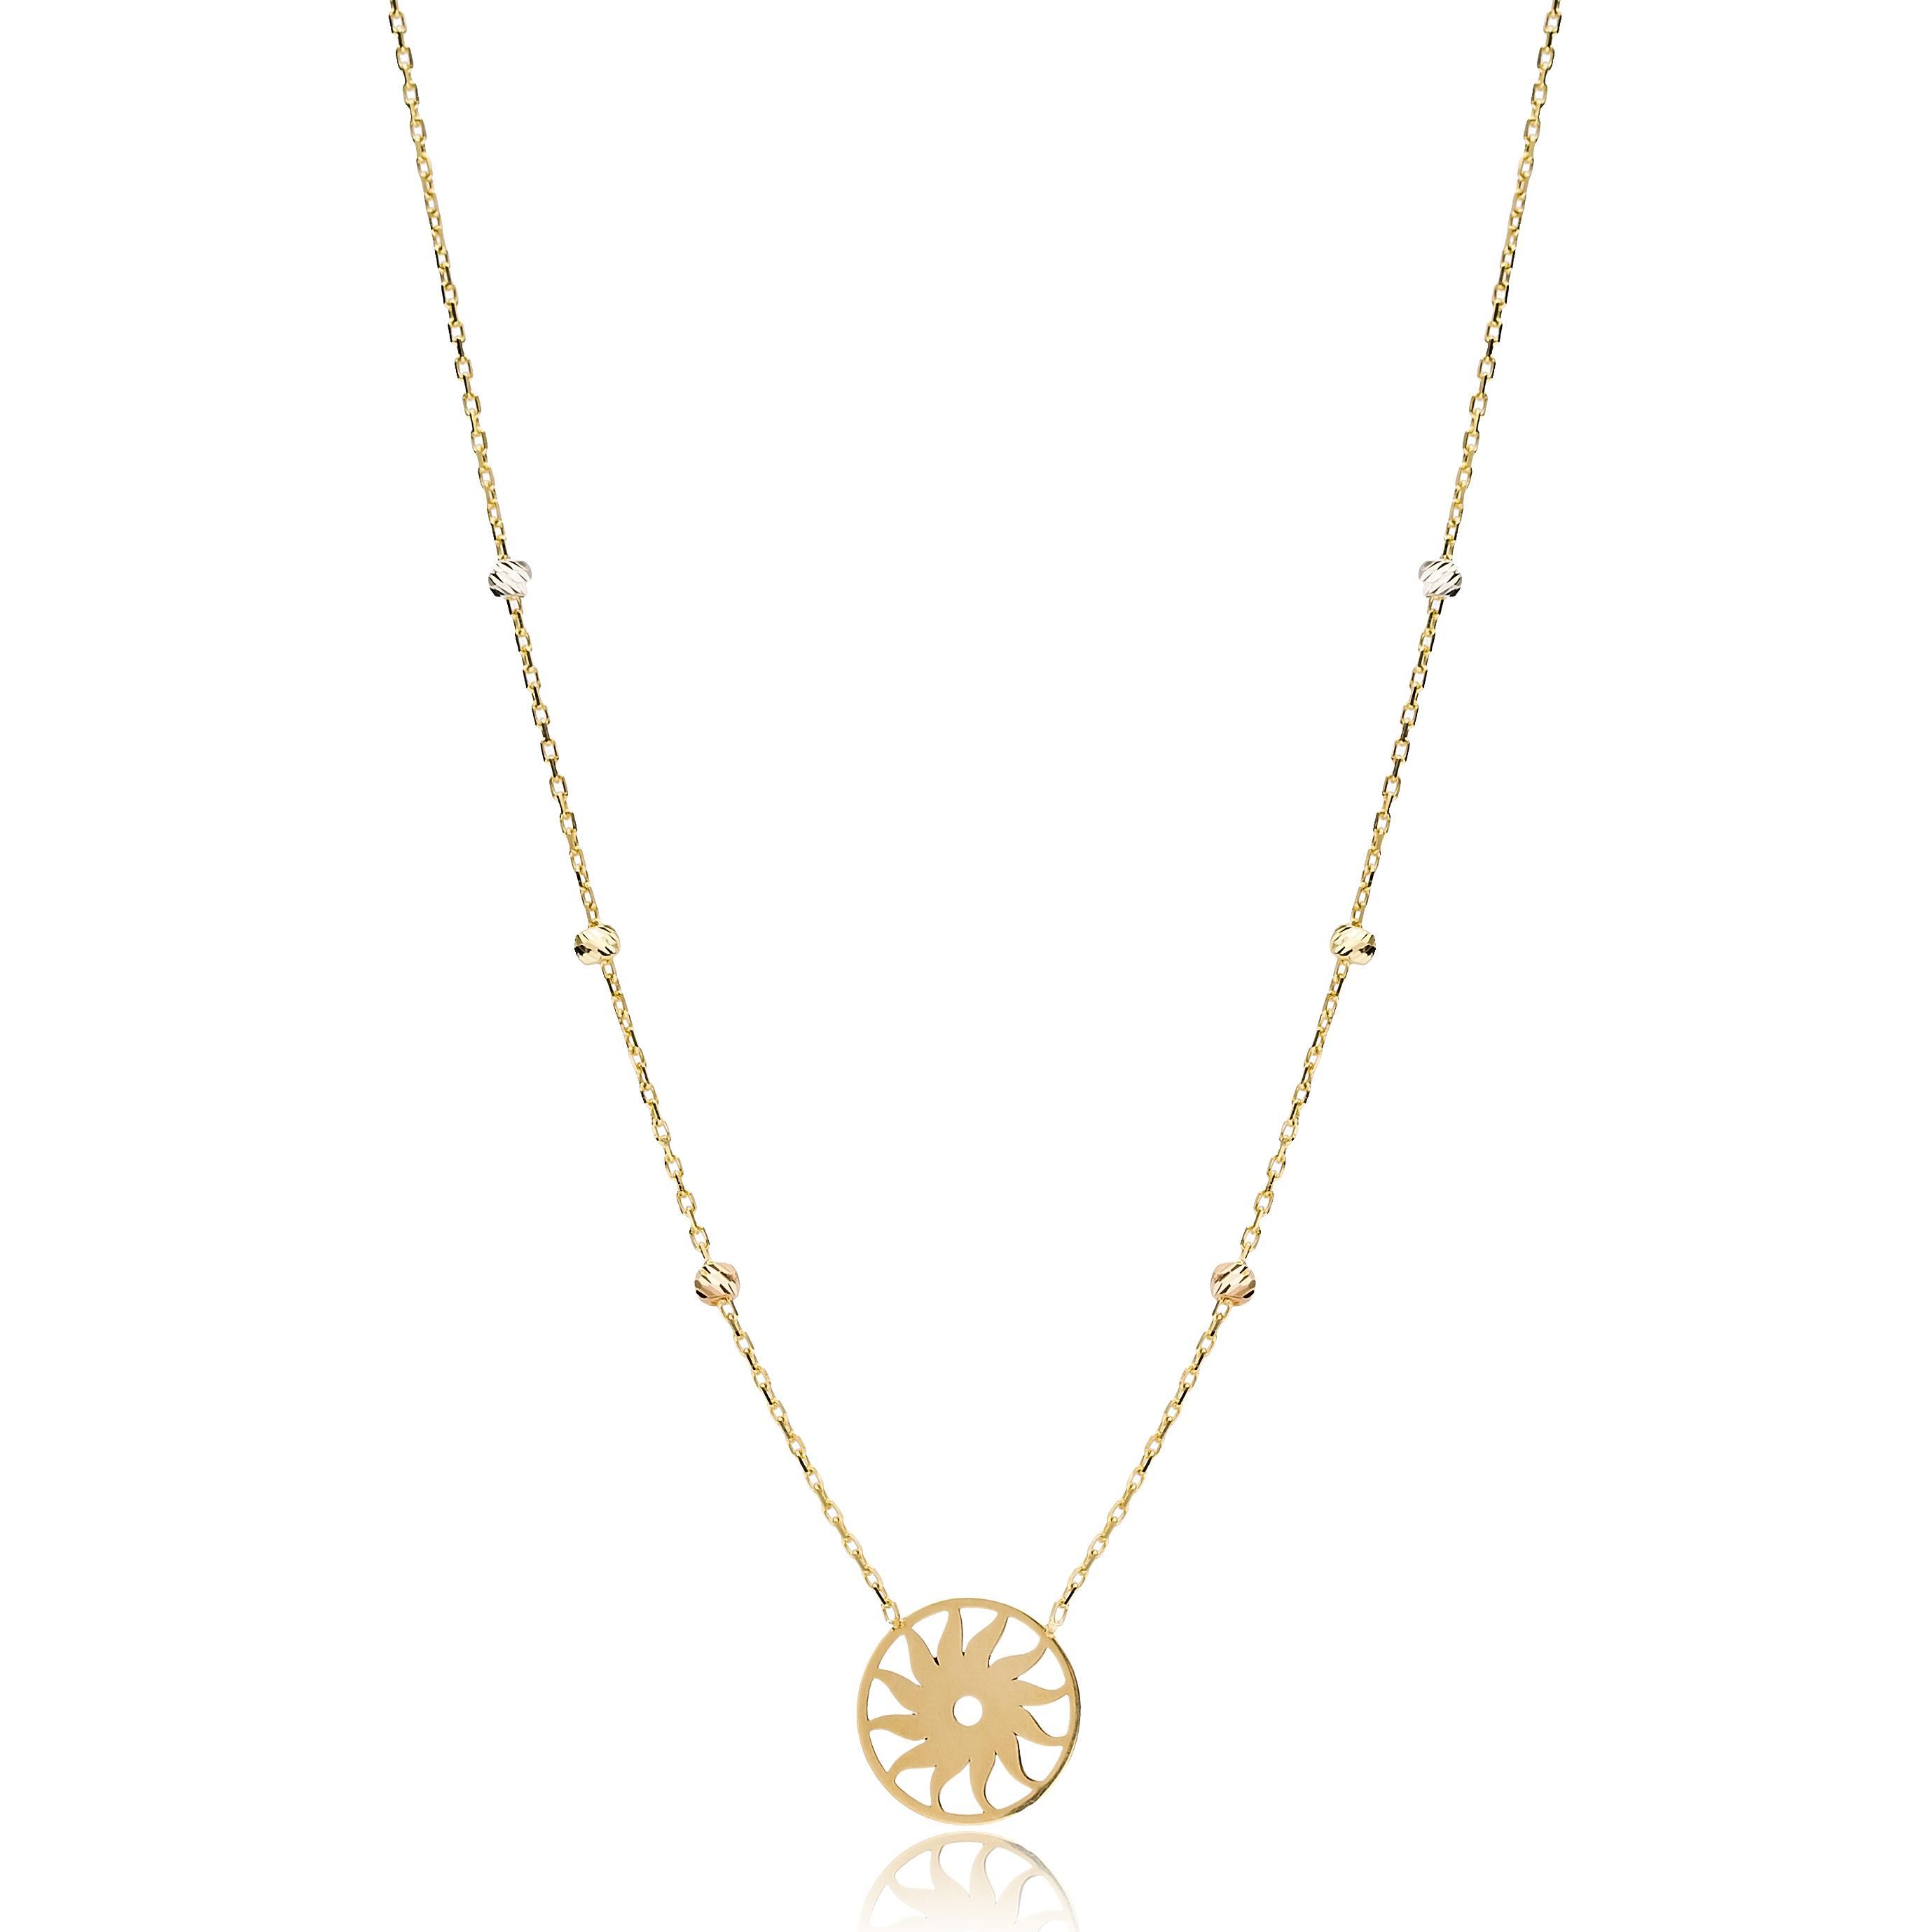 Sun Shape Necklace Wholesale Handmade Turkish 14K Jewelry